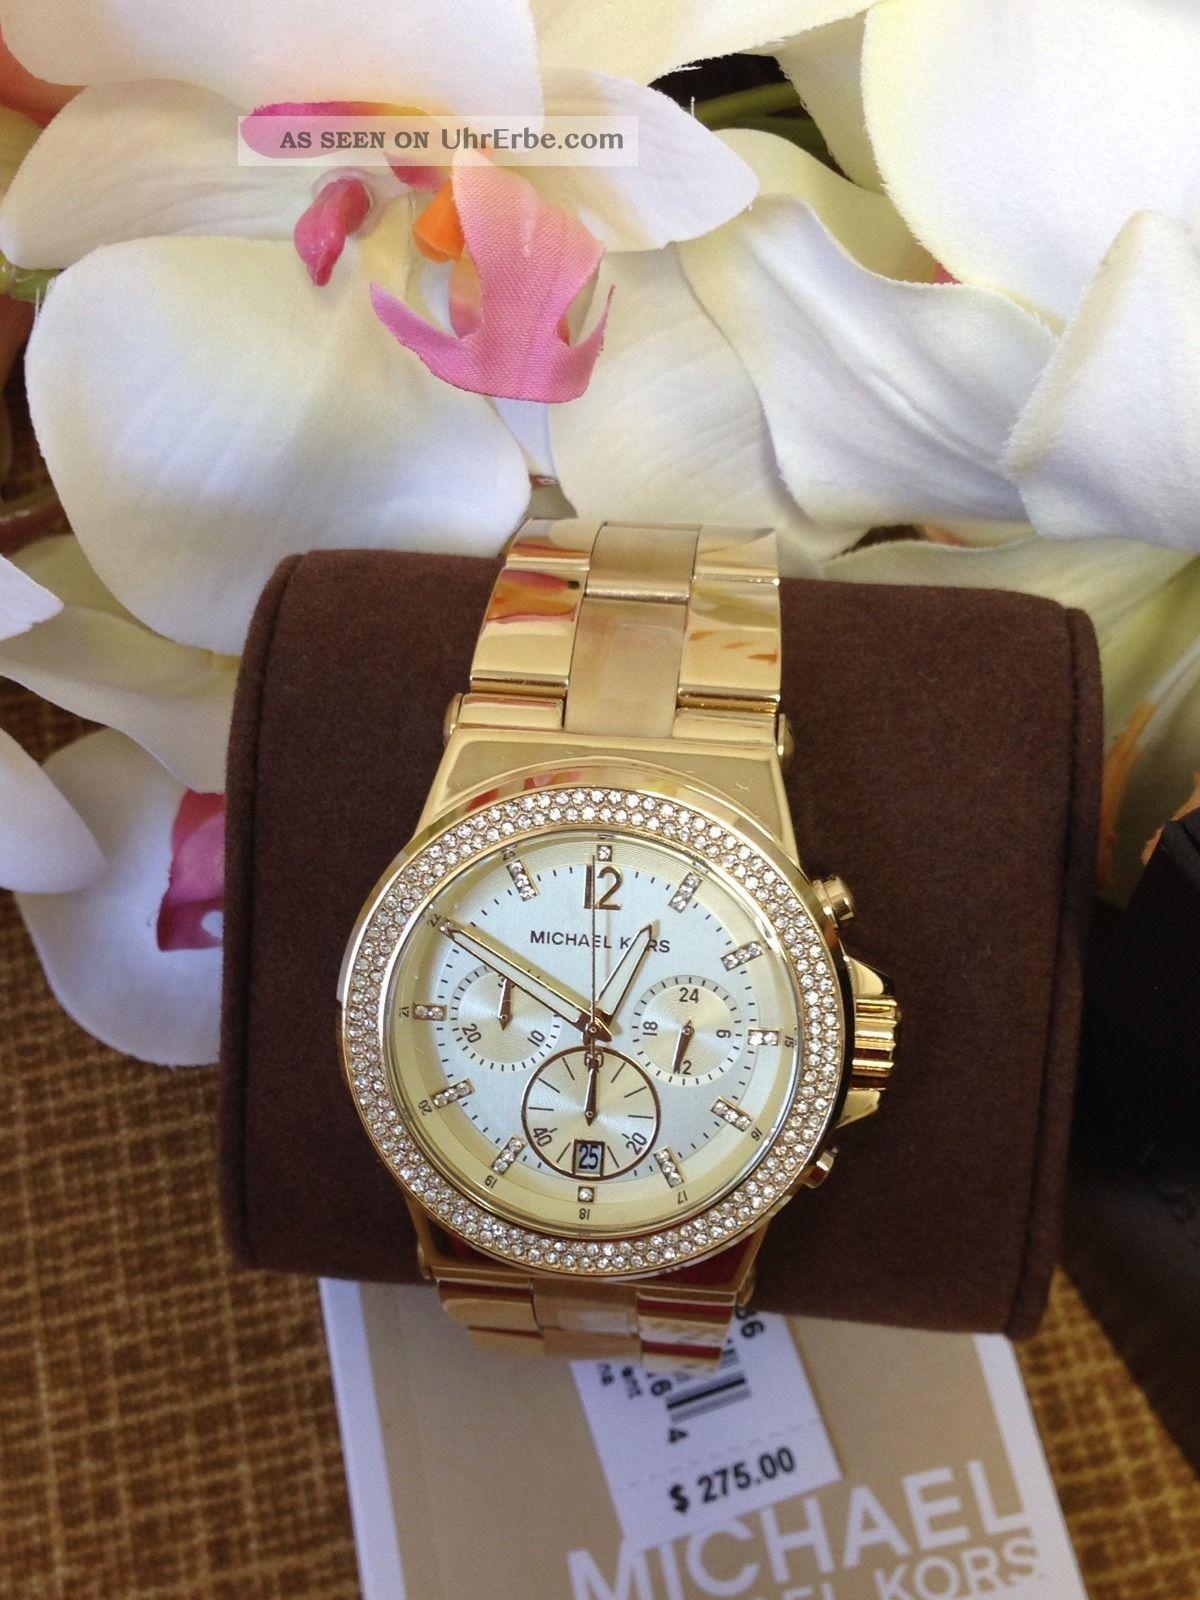 Michael Kors Mk5386 Damen Chronograph Glitz Gold Watch Weihnachten Armbanduhren Bild